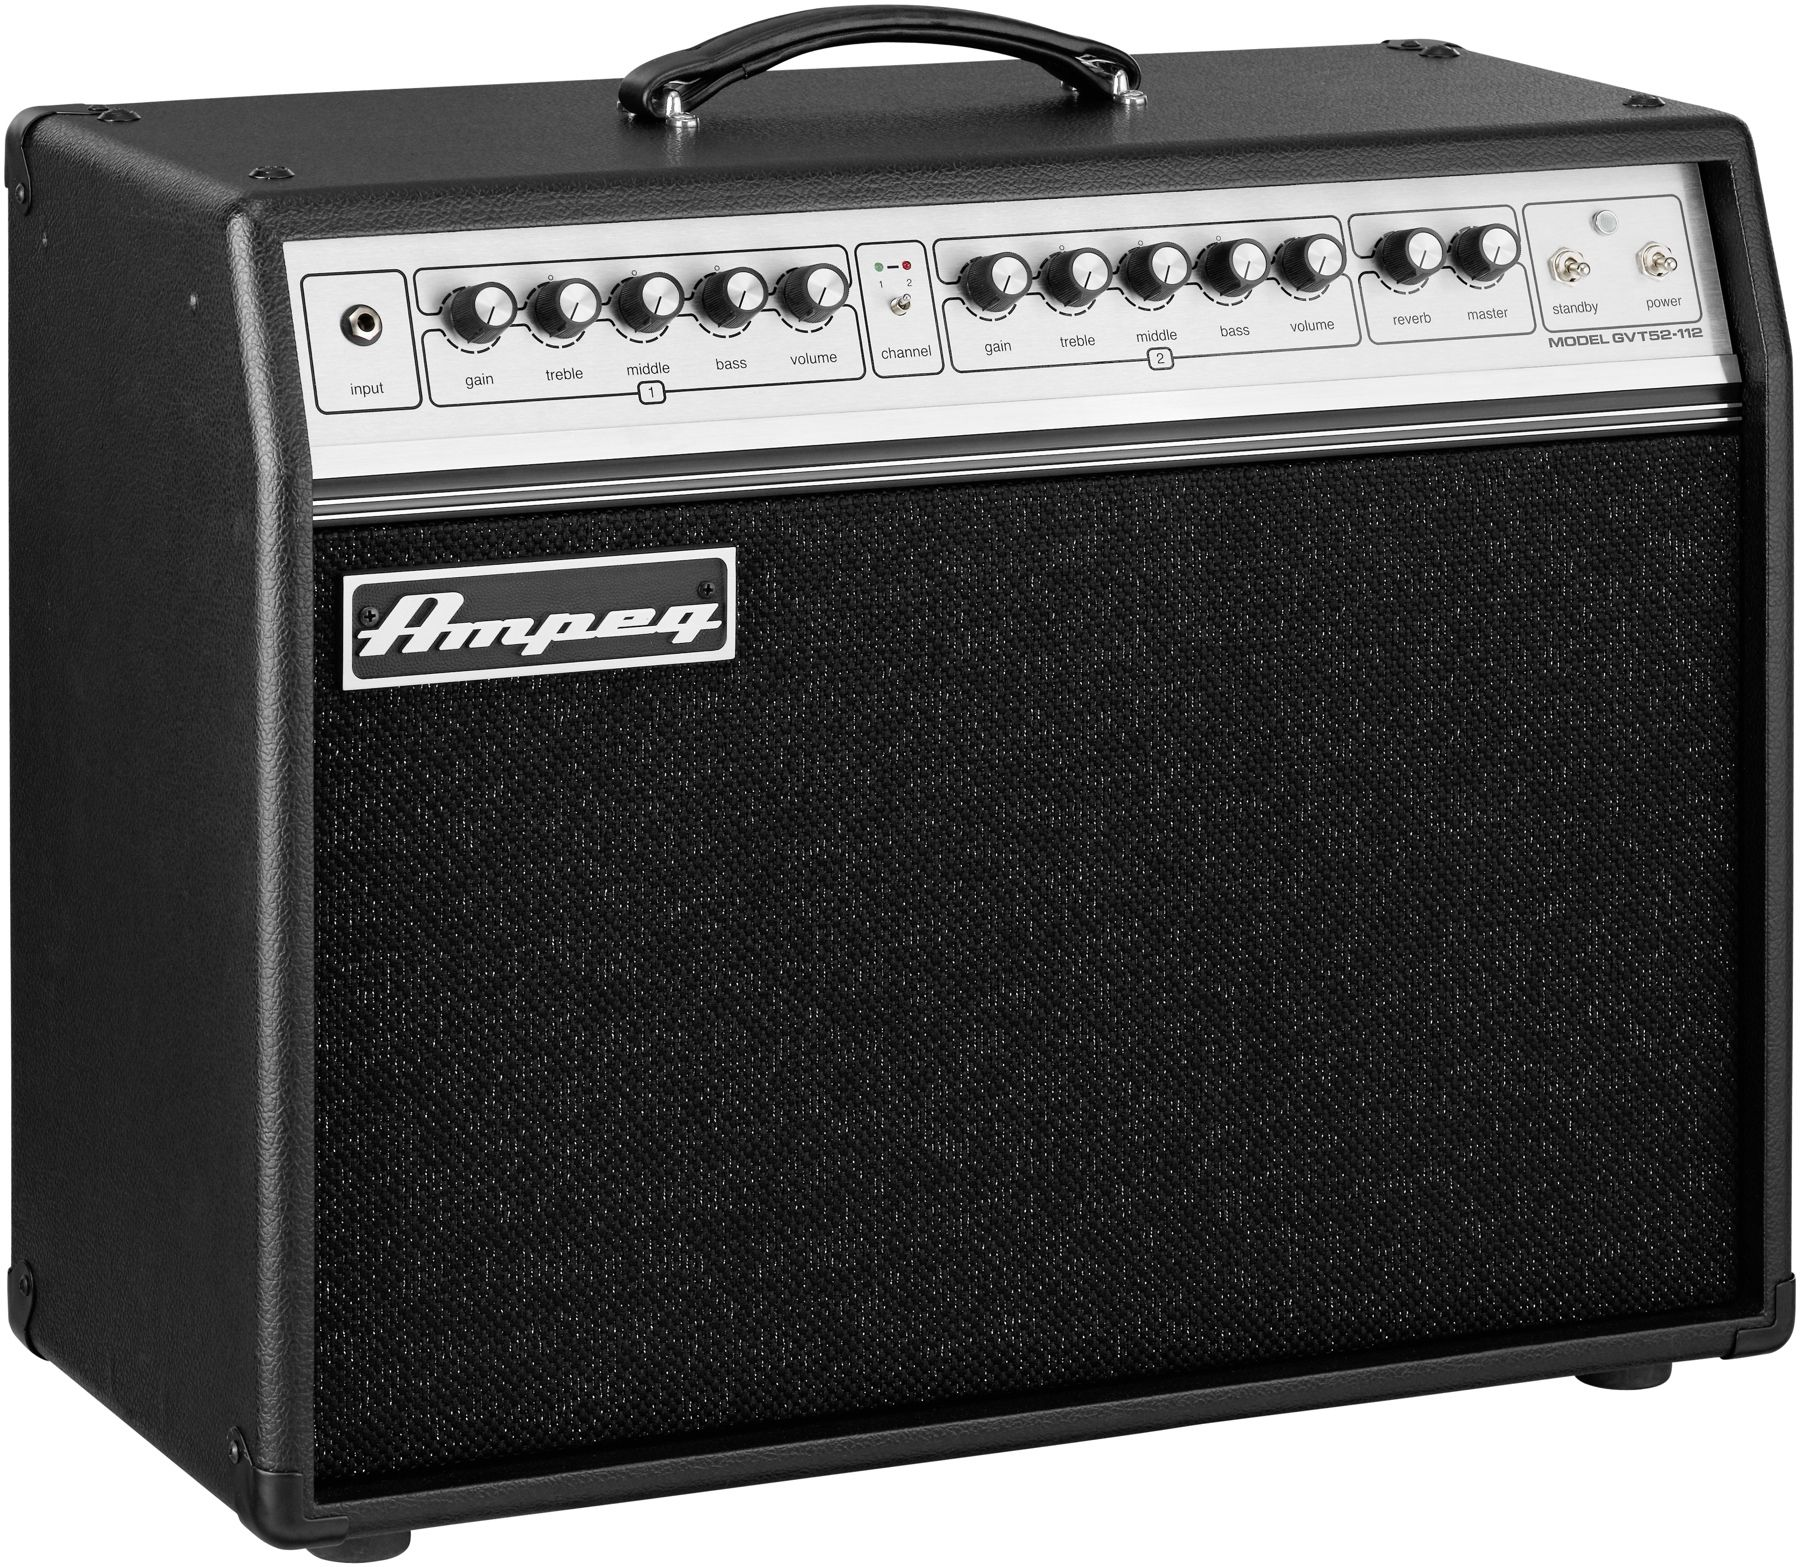 Boss Katana 100 212 Mkii 2x12 100 Watt Combo Amp Amp Guitar Amp Guitar